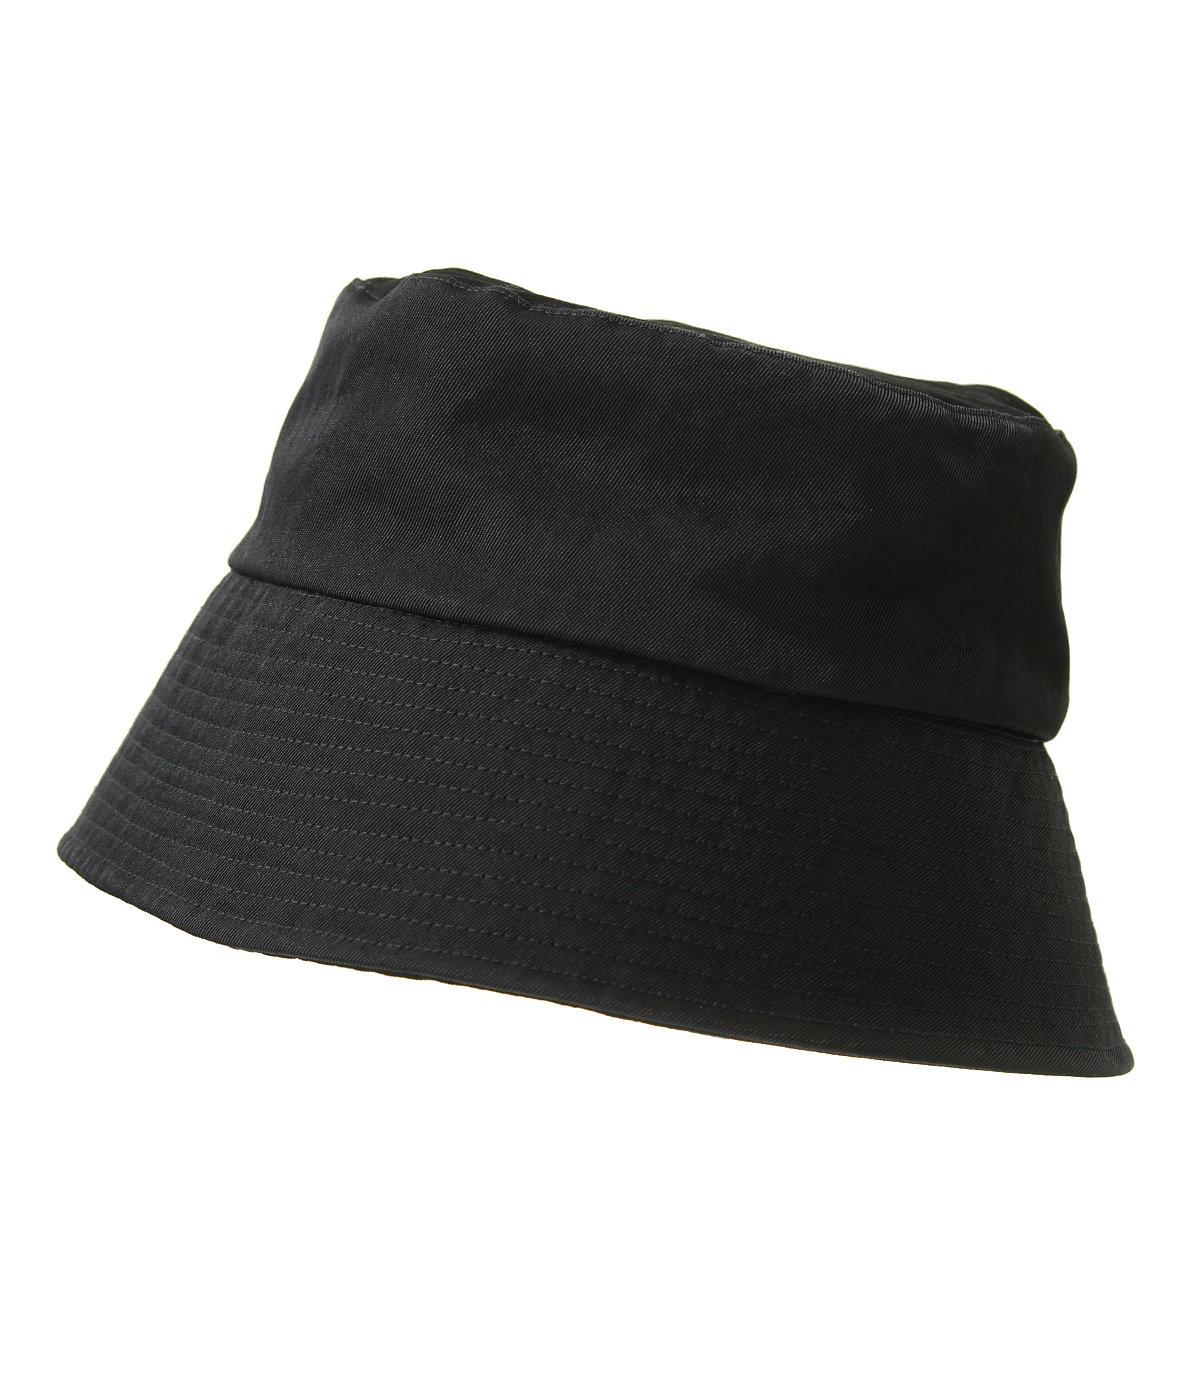 WATERPROOF NYLON BUCKET HAT